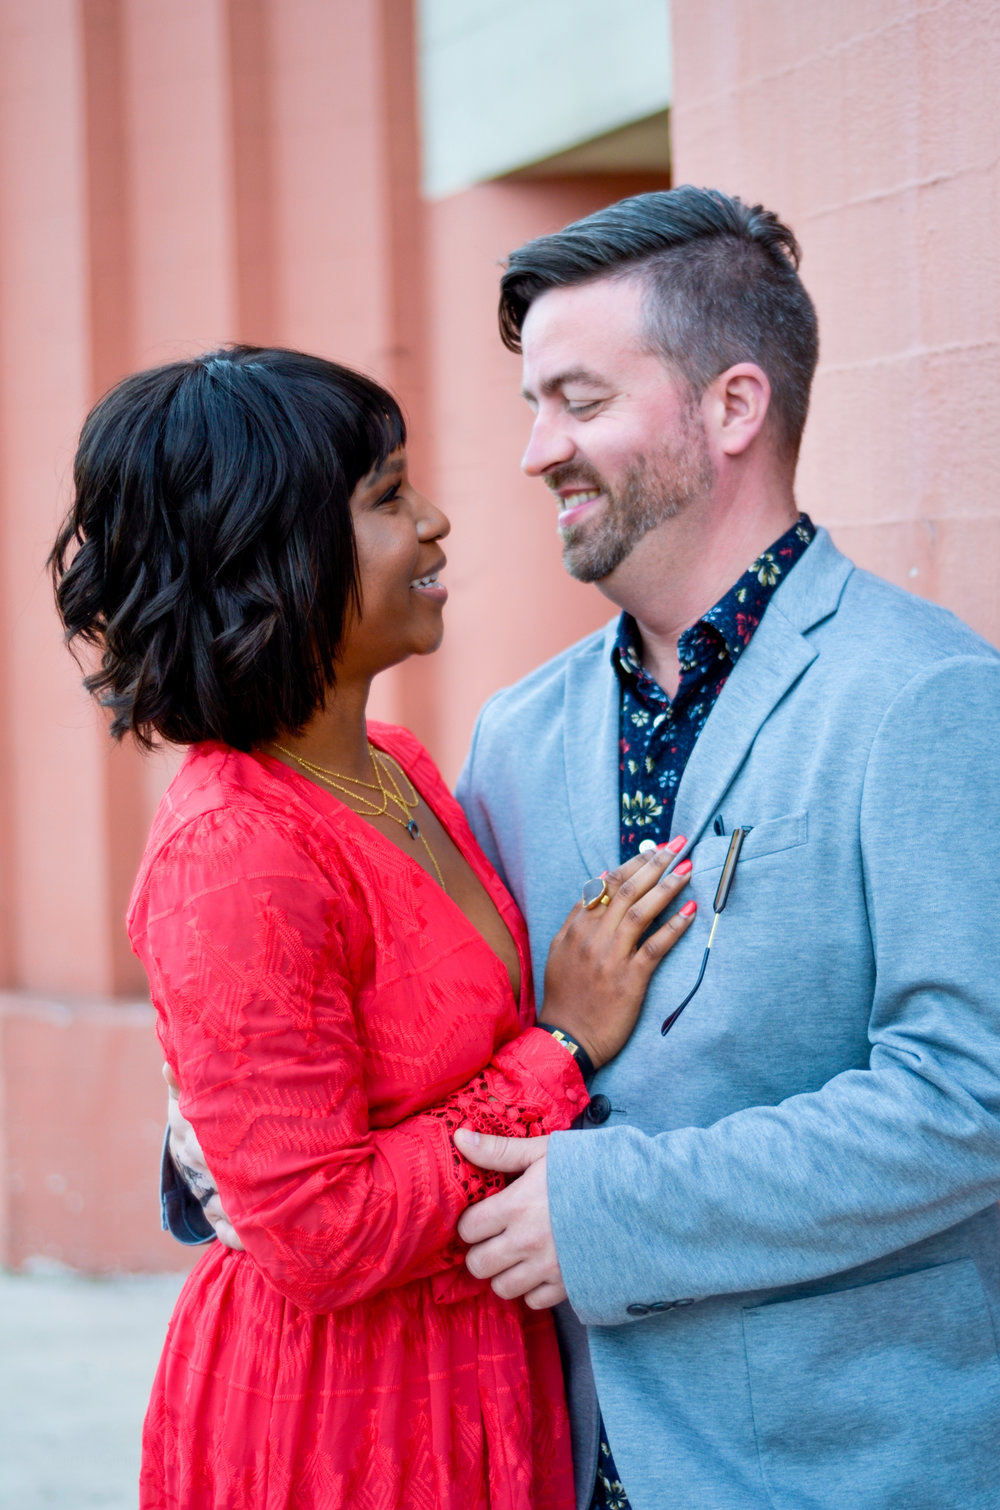 interracial couple lifestyle photoshoot in santa cruz with photographer brittany gorman of seventh skin makeup by kim baker beauty san jose california makeup artist